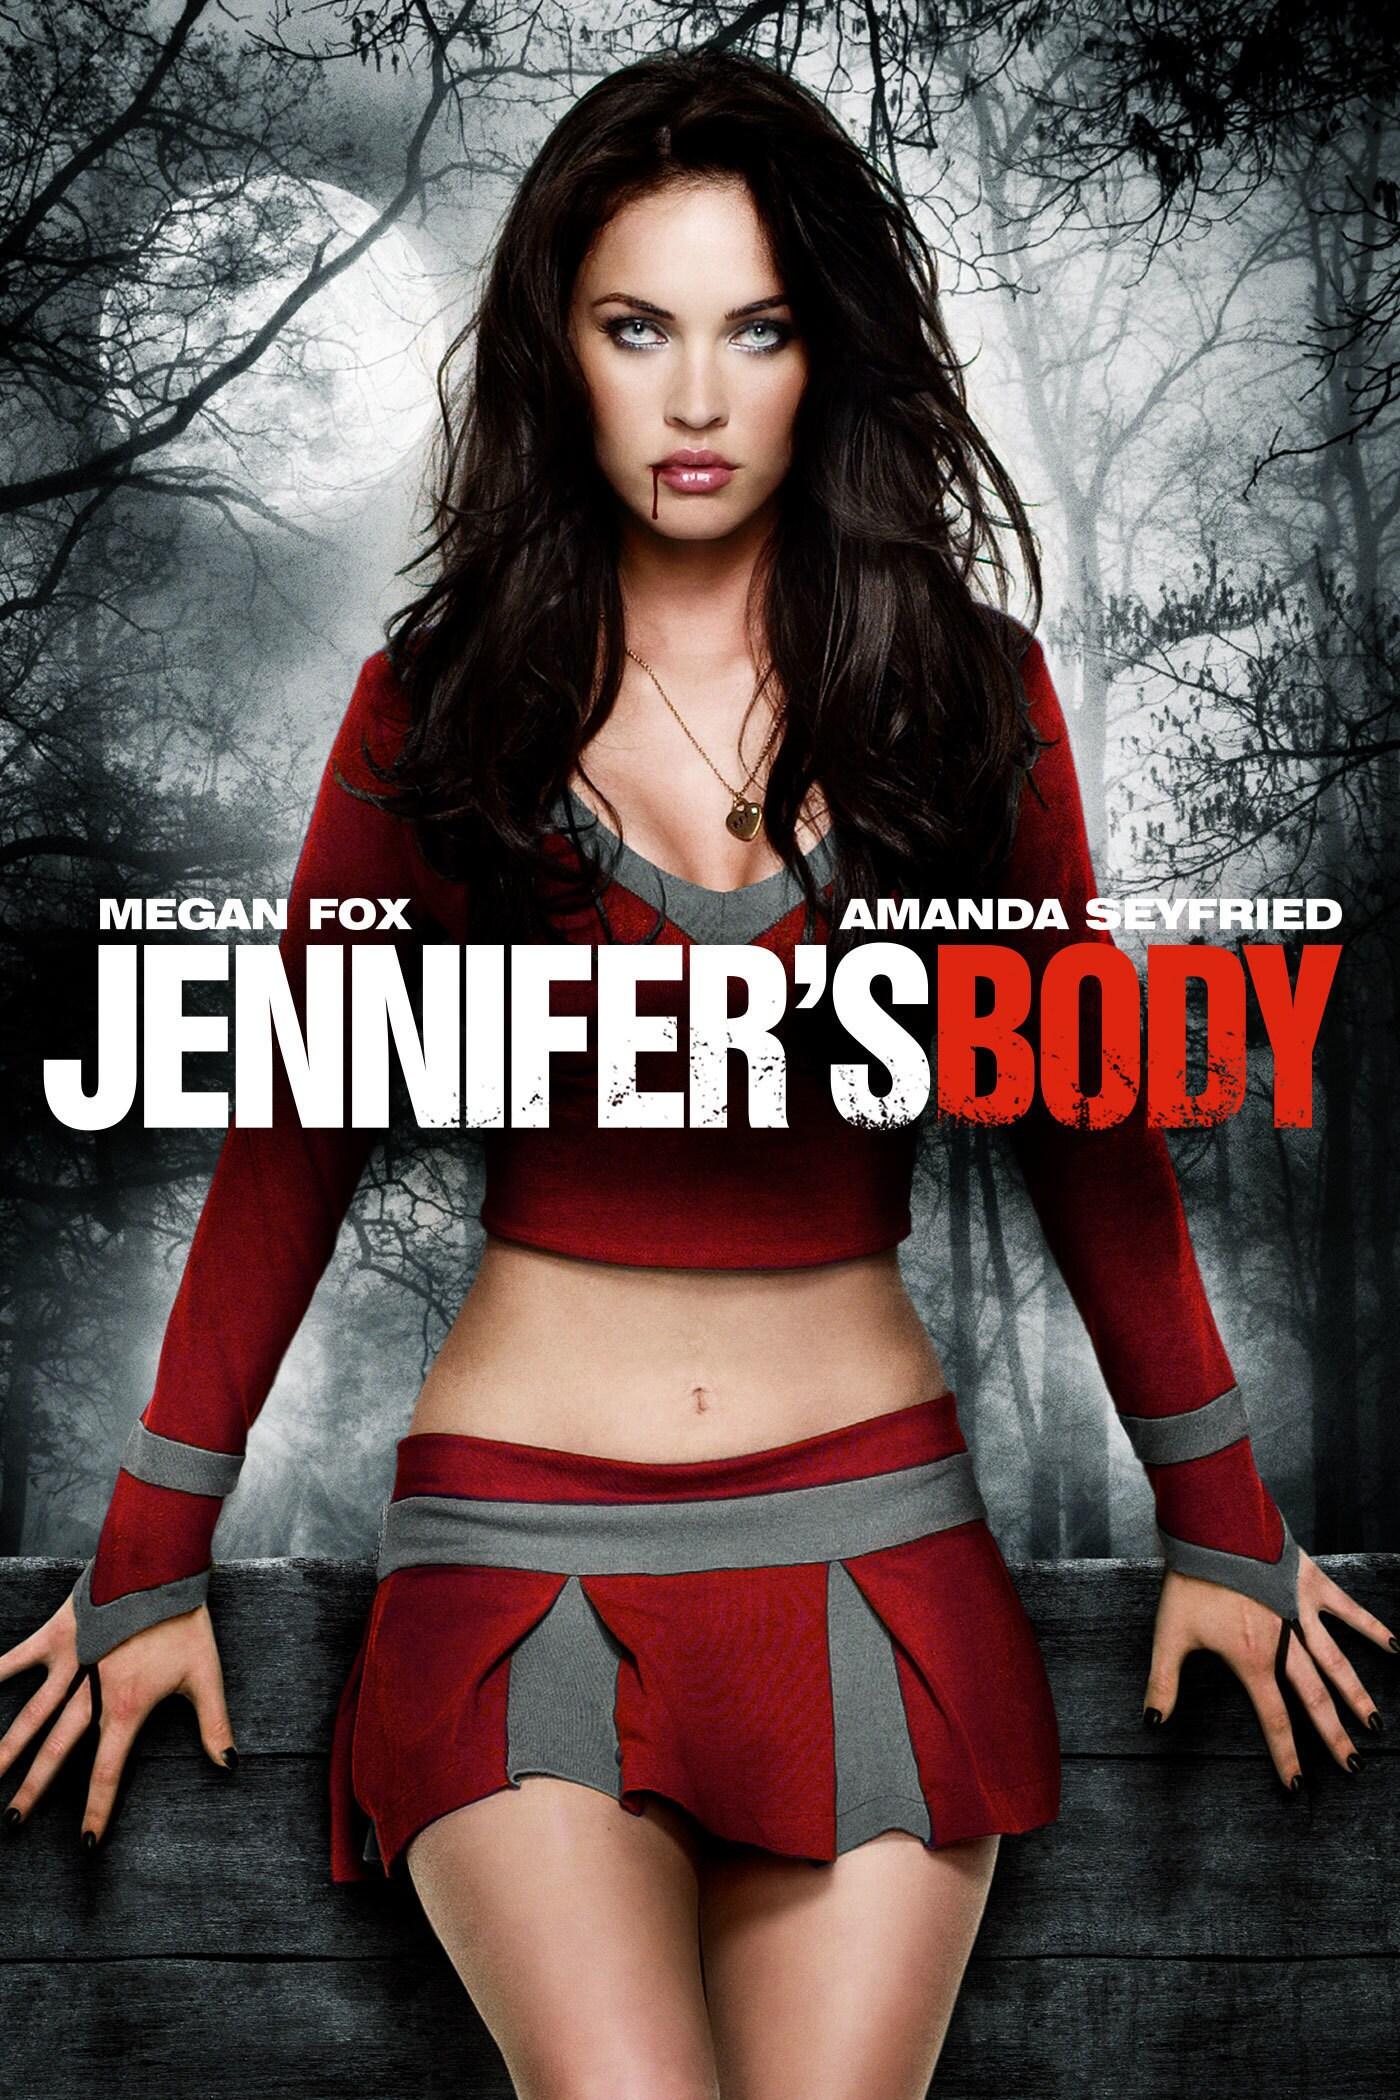 Jennifer's Body starring Megan Fox and Amanda Seyfried movie poster